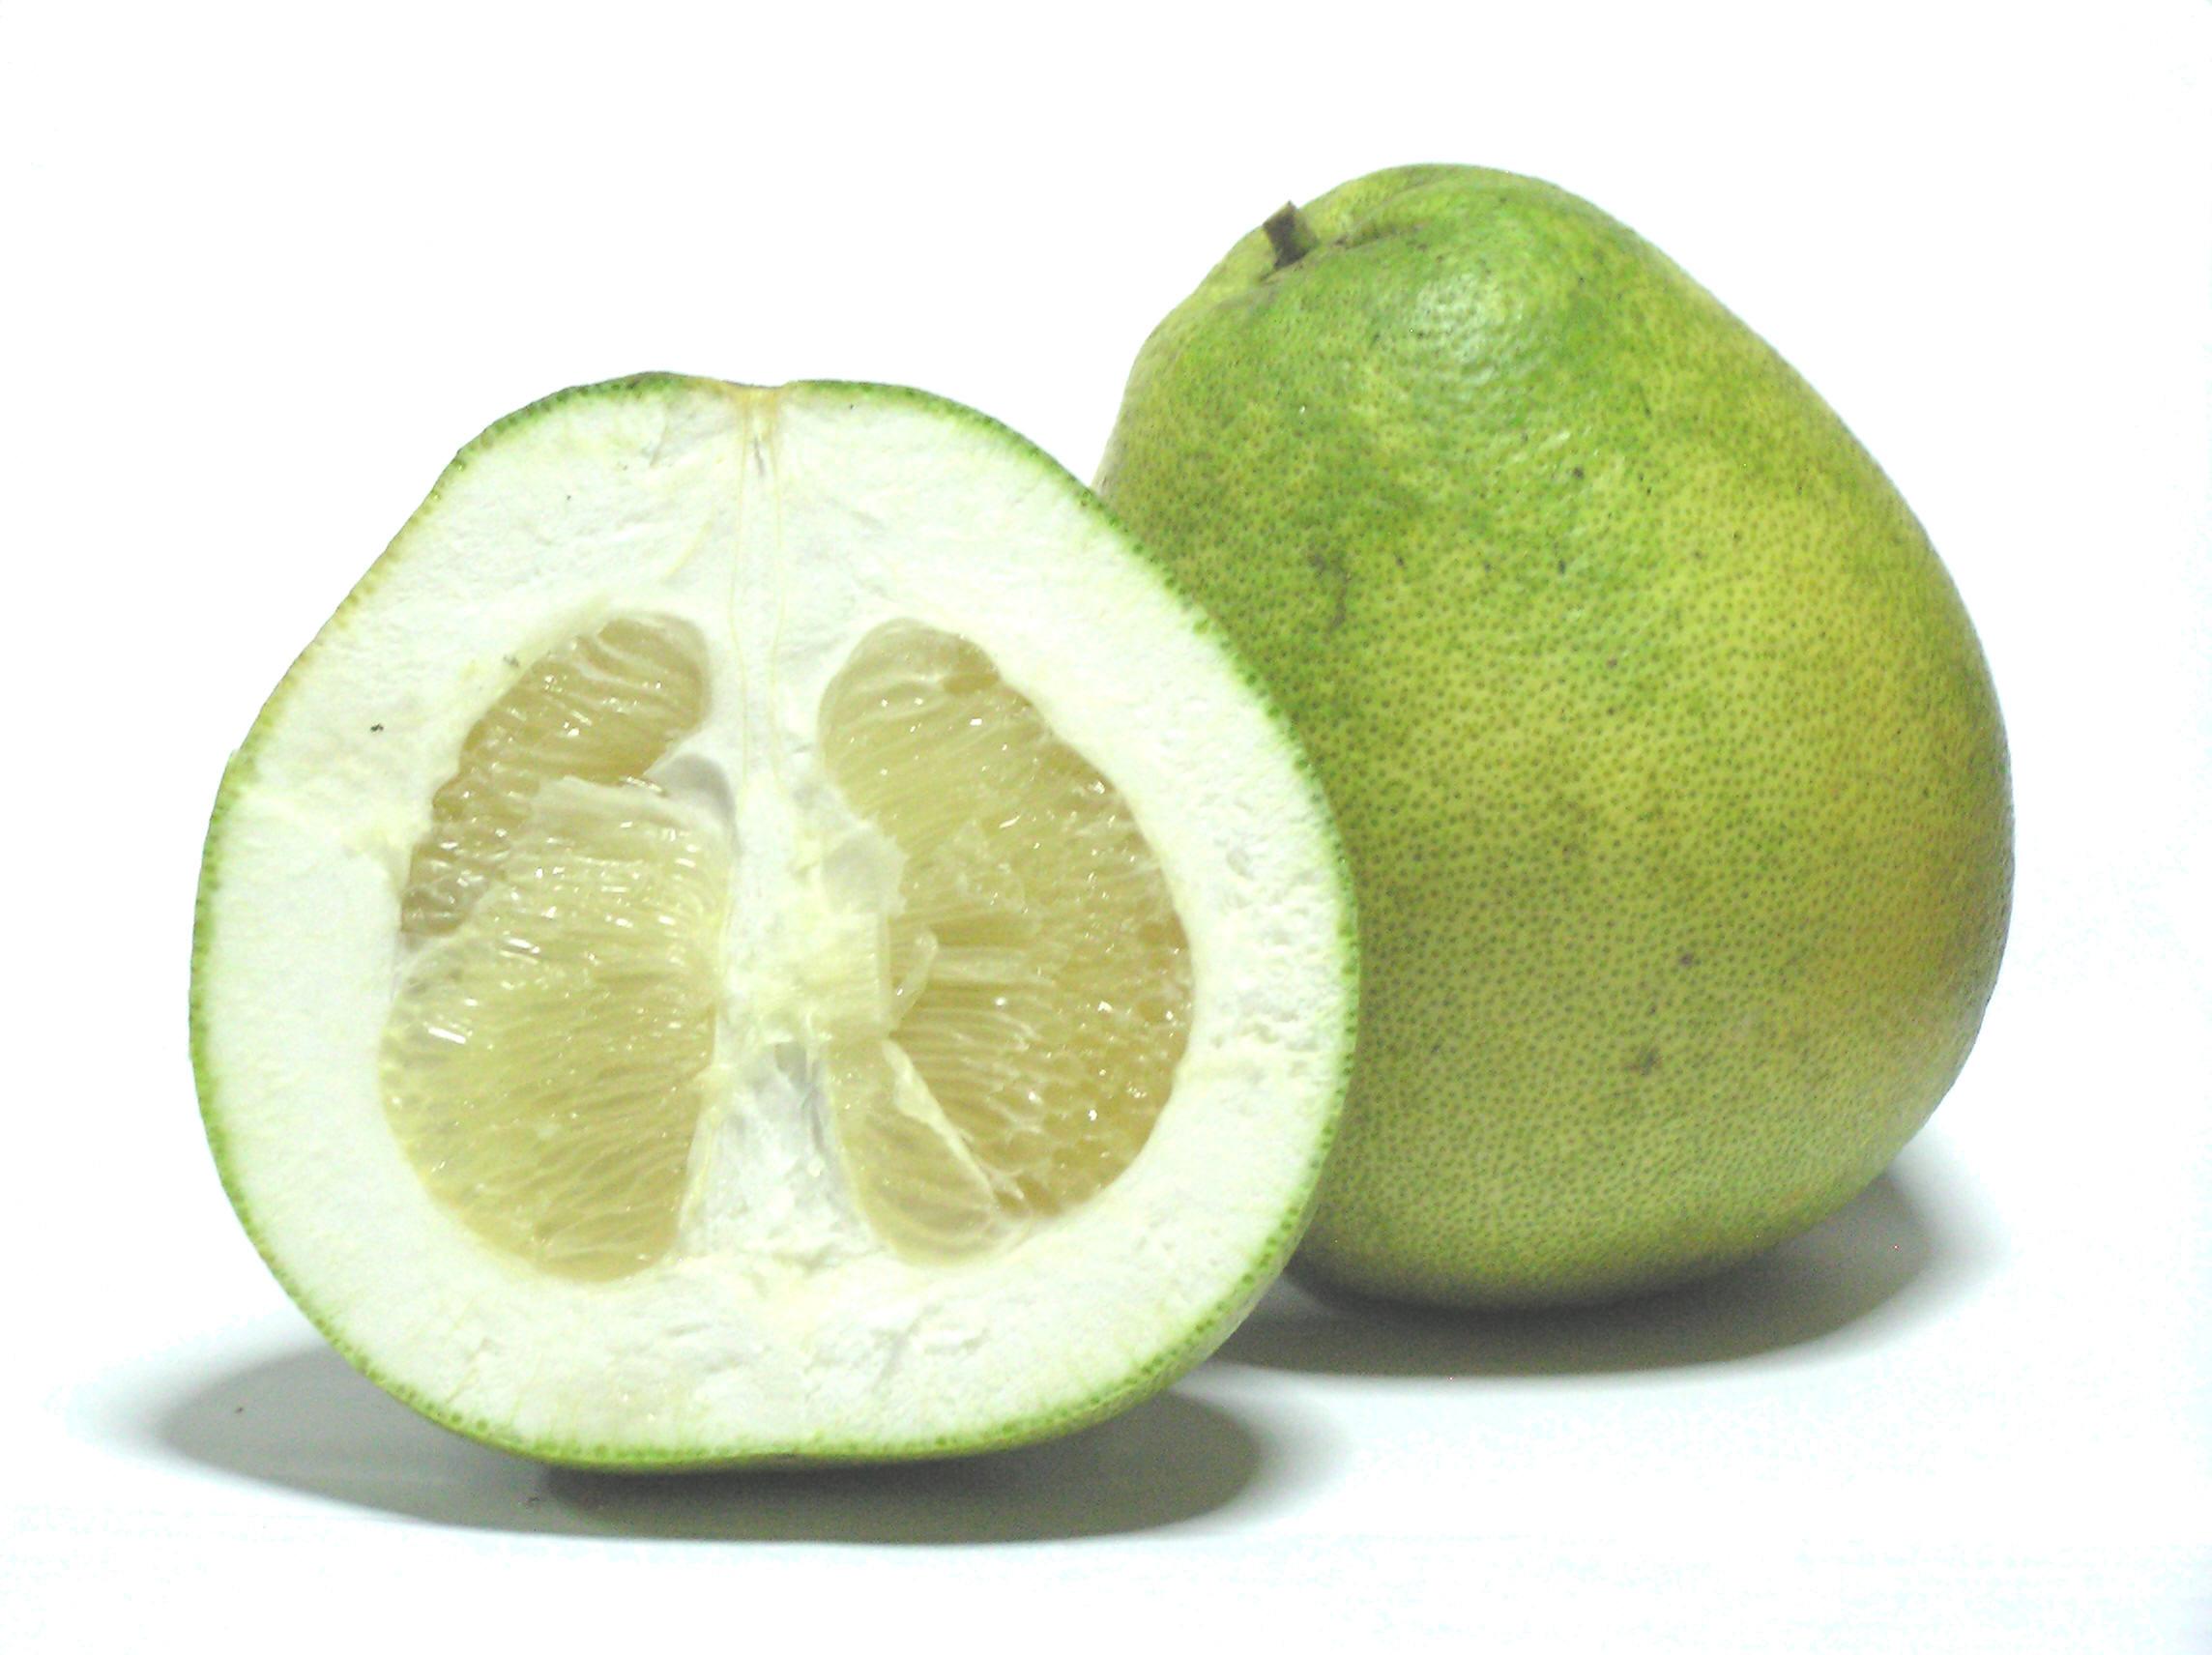 https://upload.wikimedia.org/wikipedia/commons/1/1c/Citrus_grandis_-_Honey_White.jpg